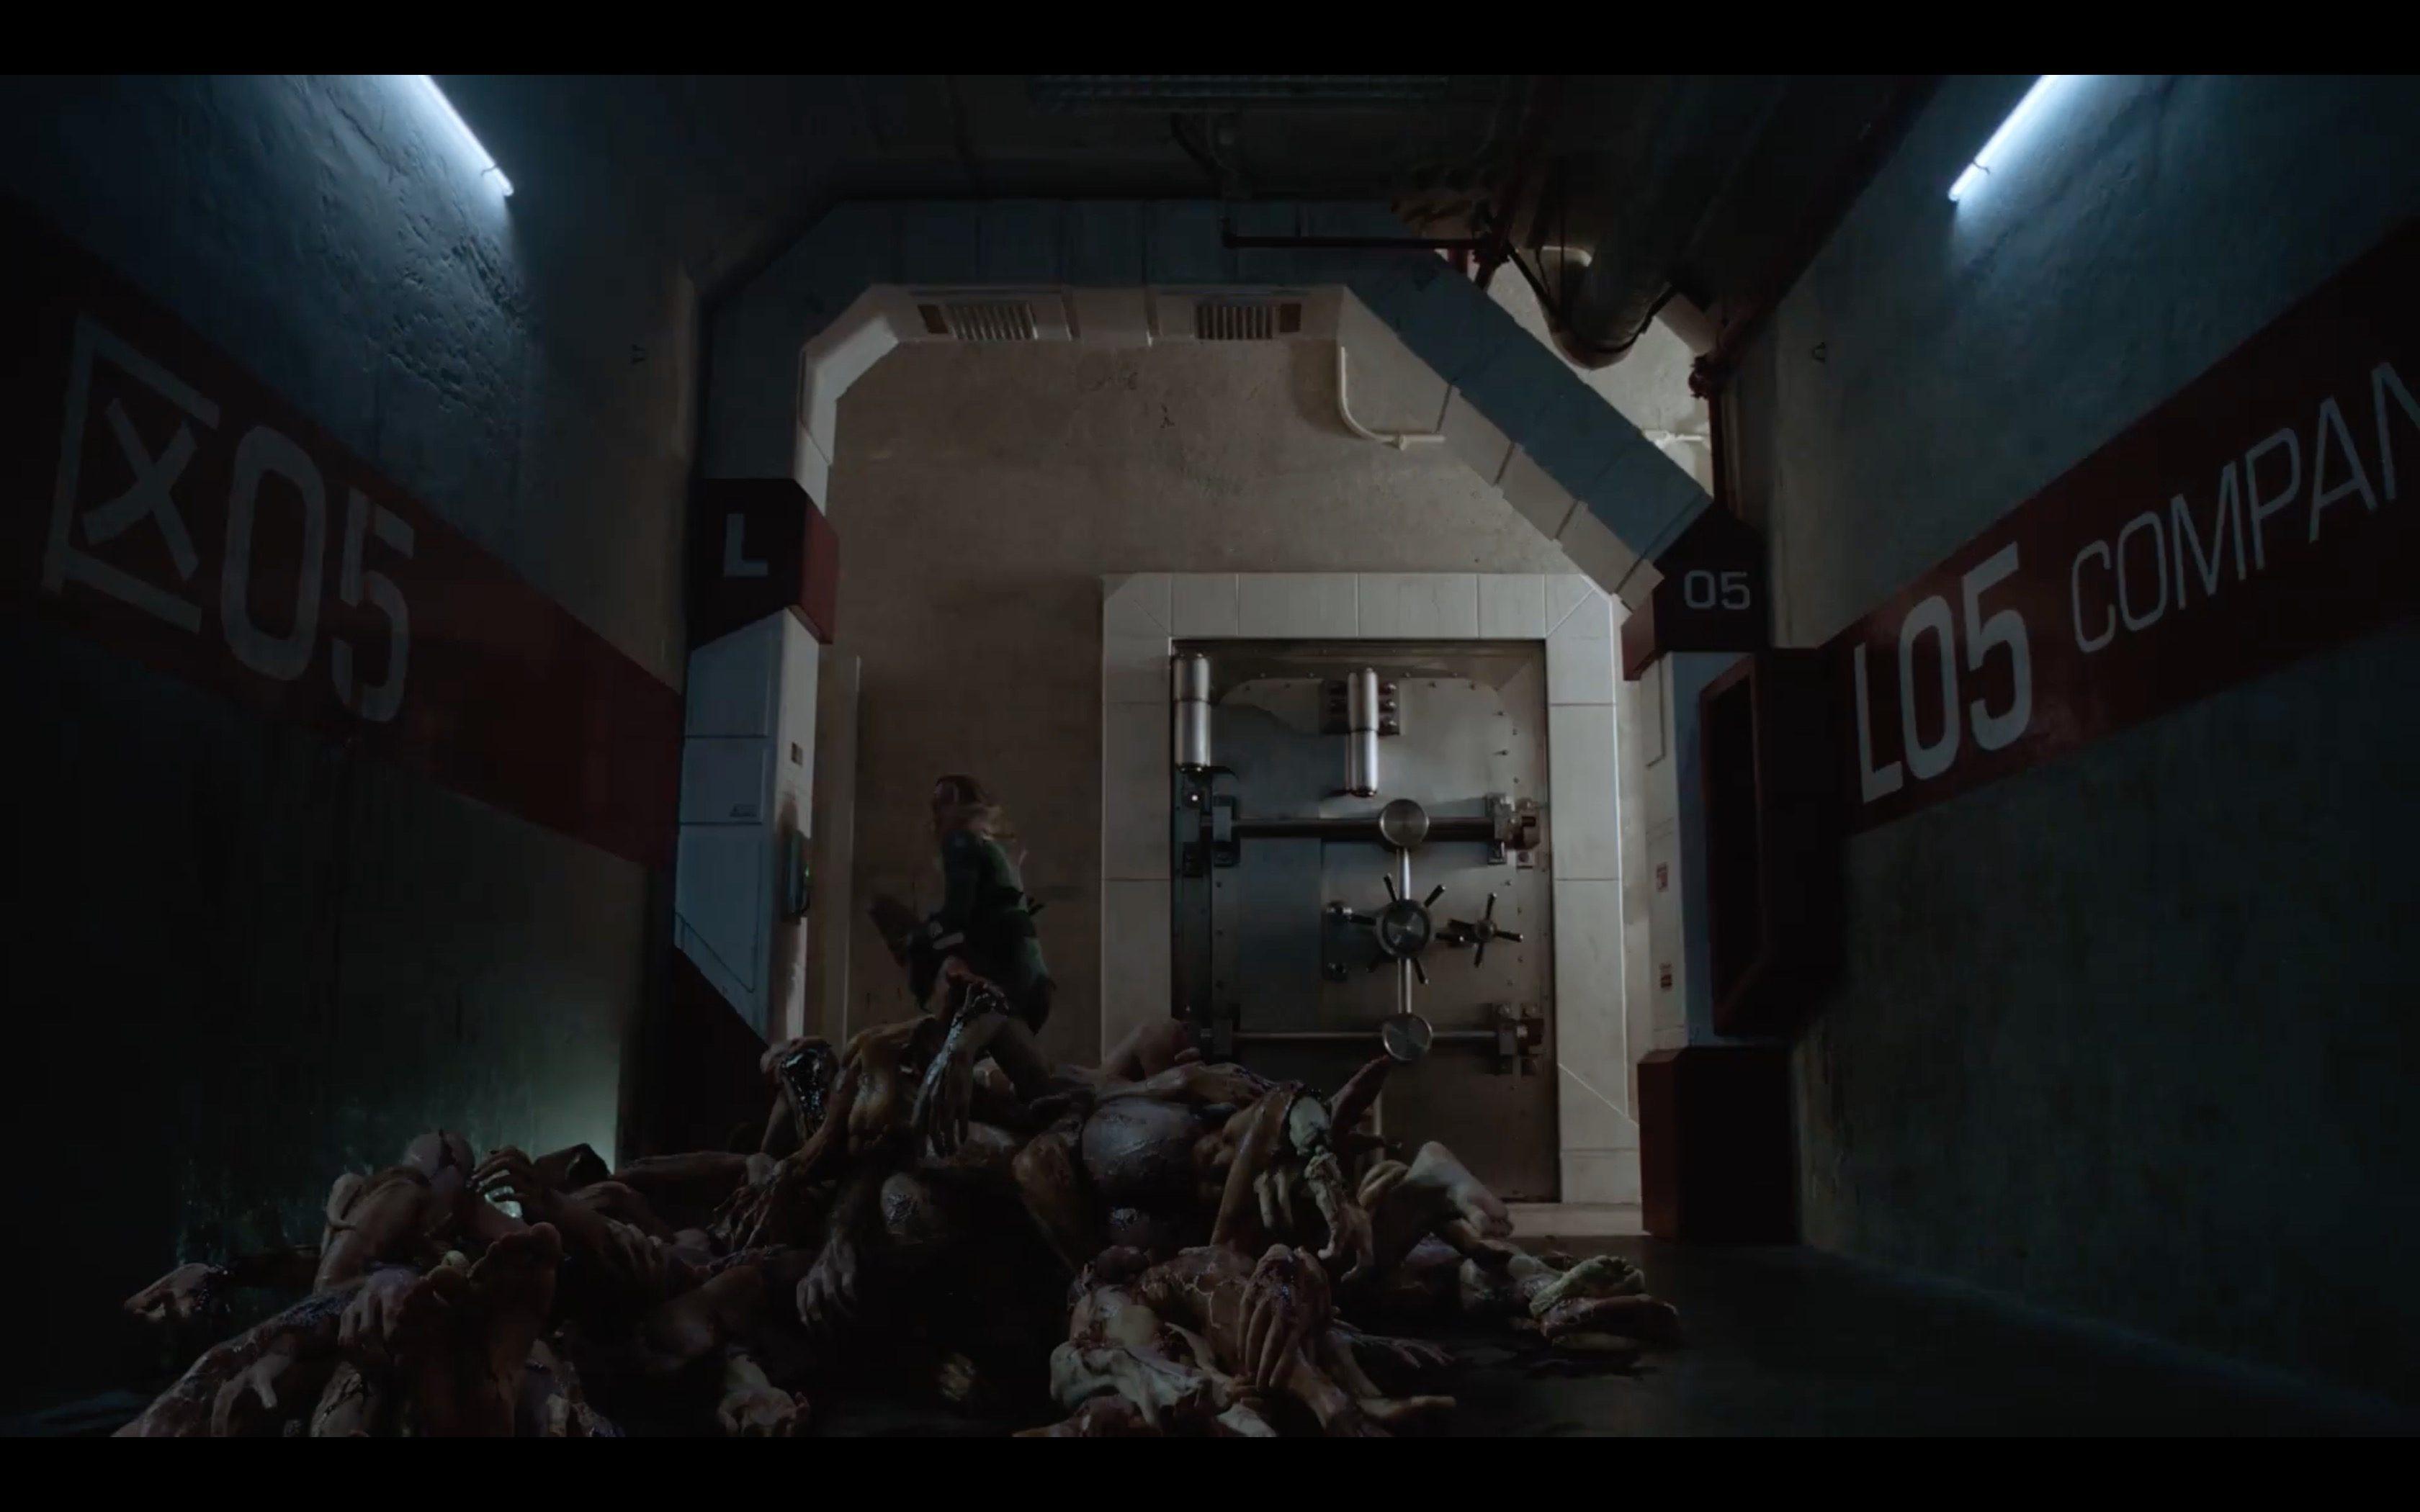 Neill Blomkamp's New Short Movie: Zygote